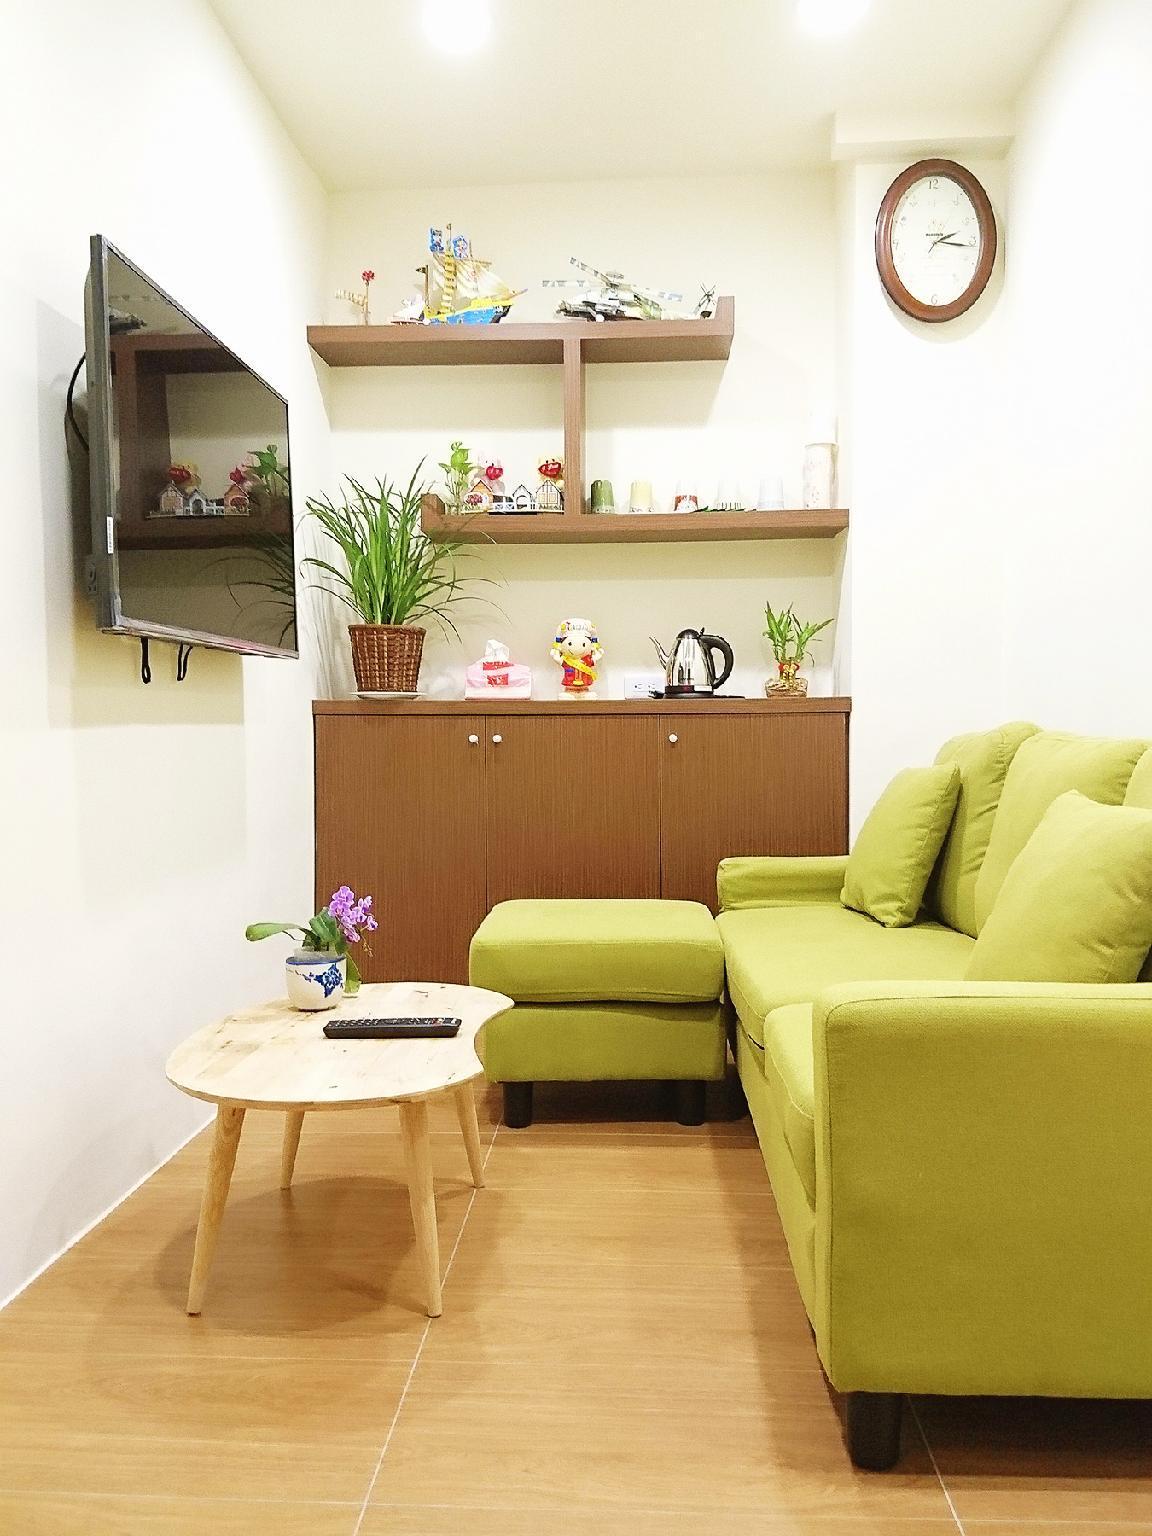 5 People Room 2 Roomsand2 Bathroomsand1 Living Room D1